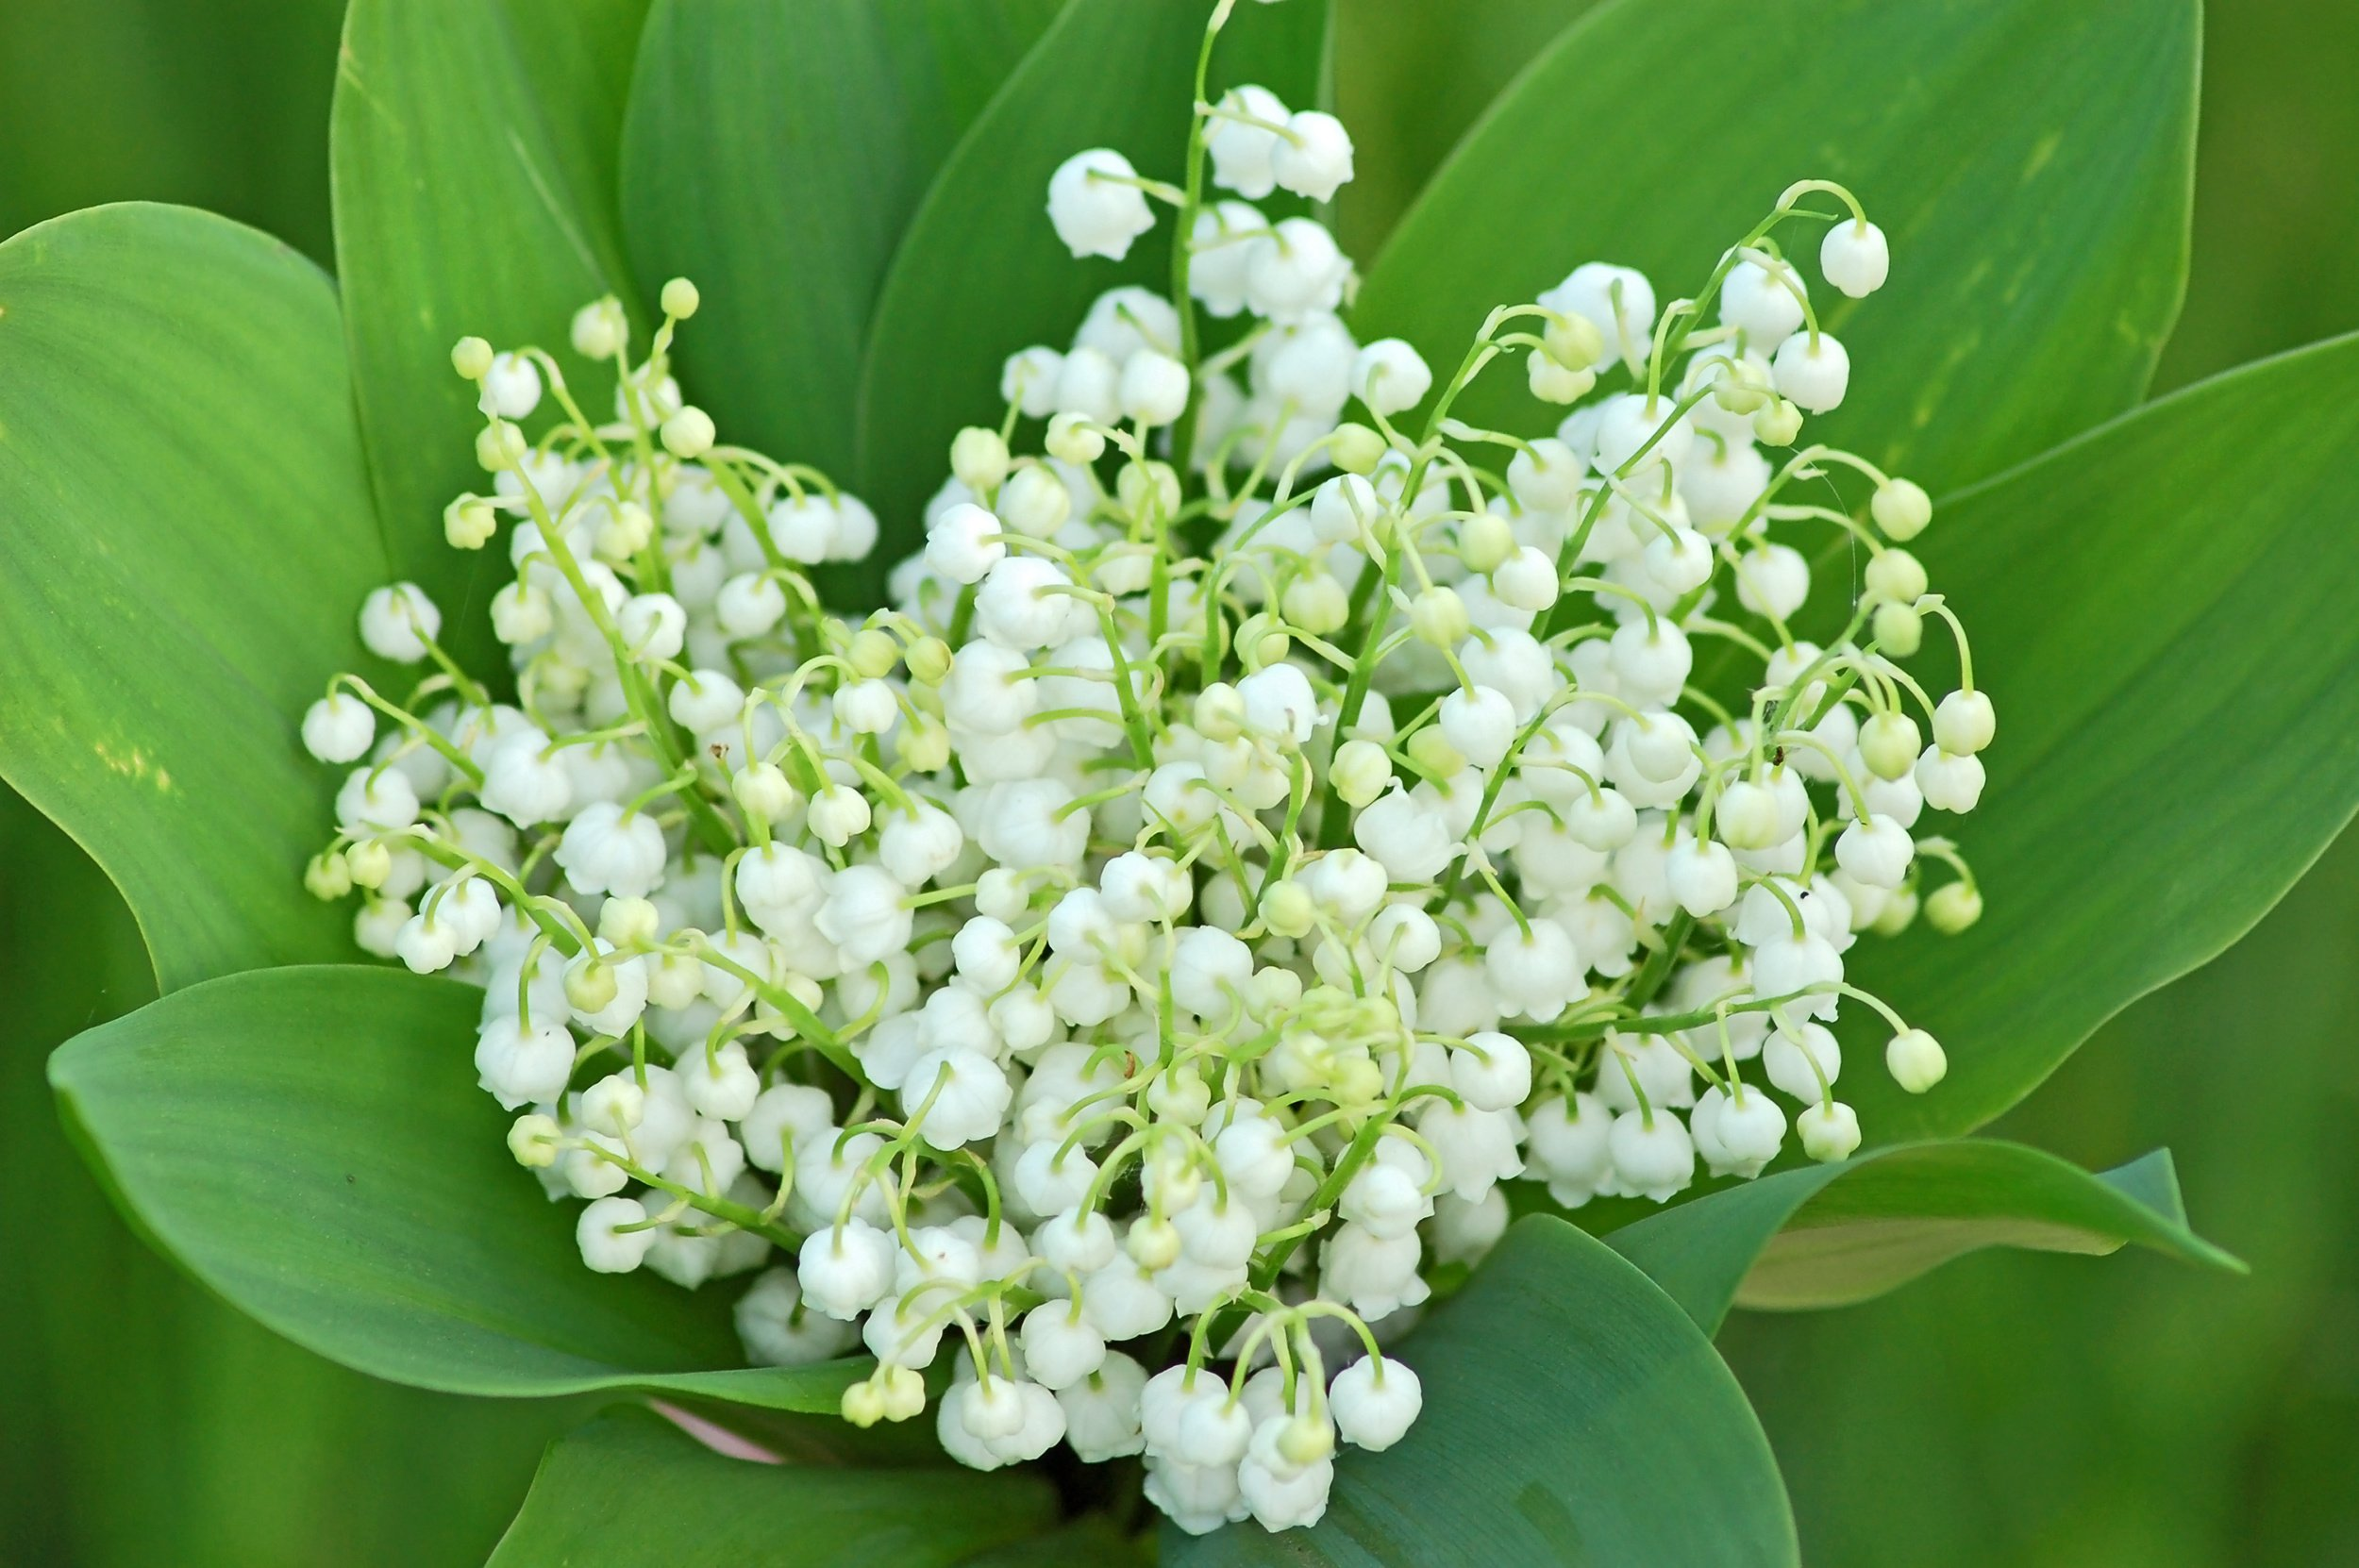 Mai, joli mois de mai Hellen-sergeyeva-fotolia.com_